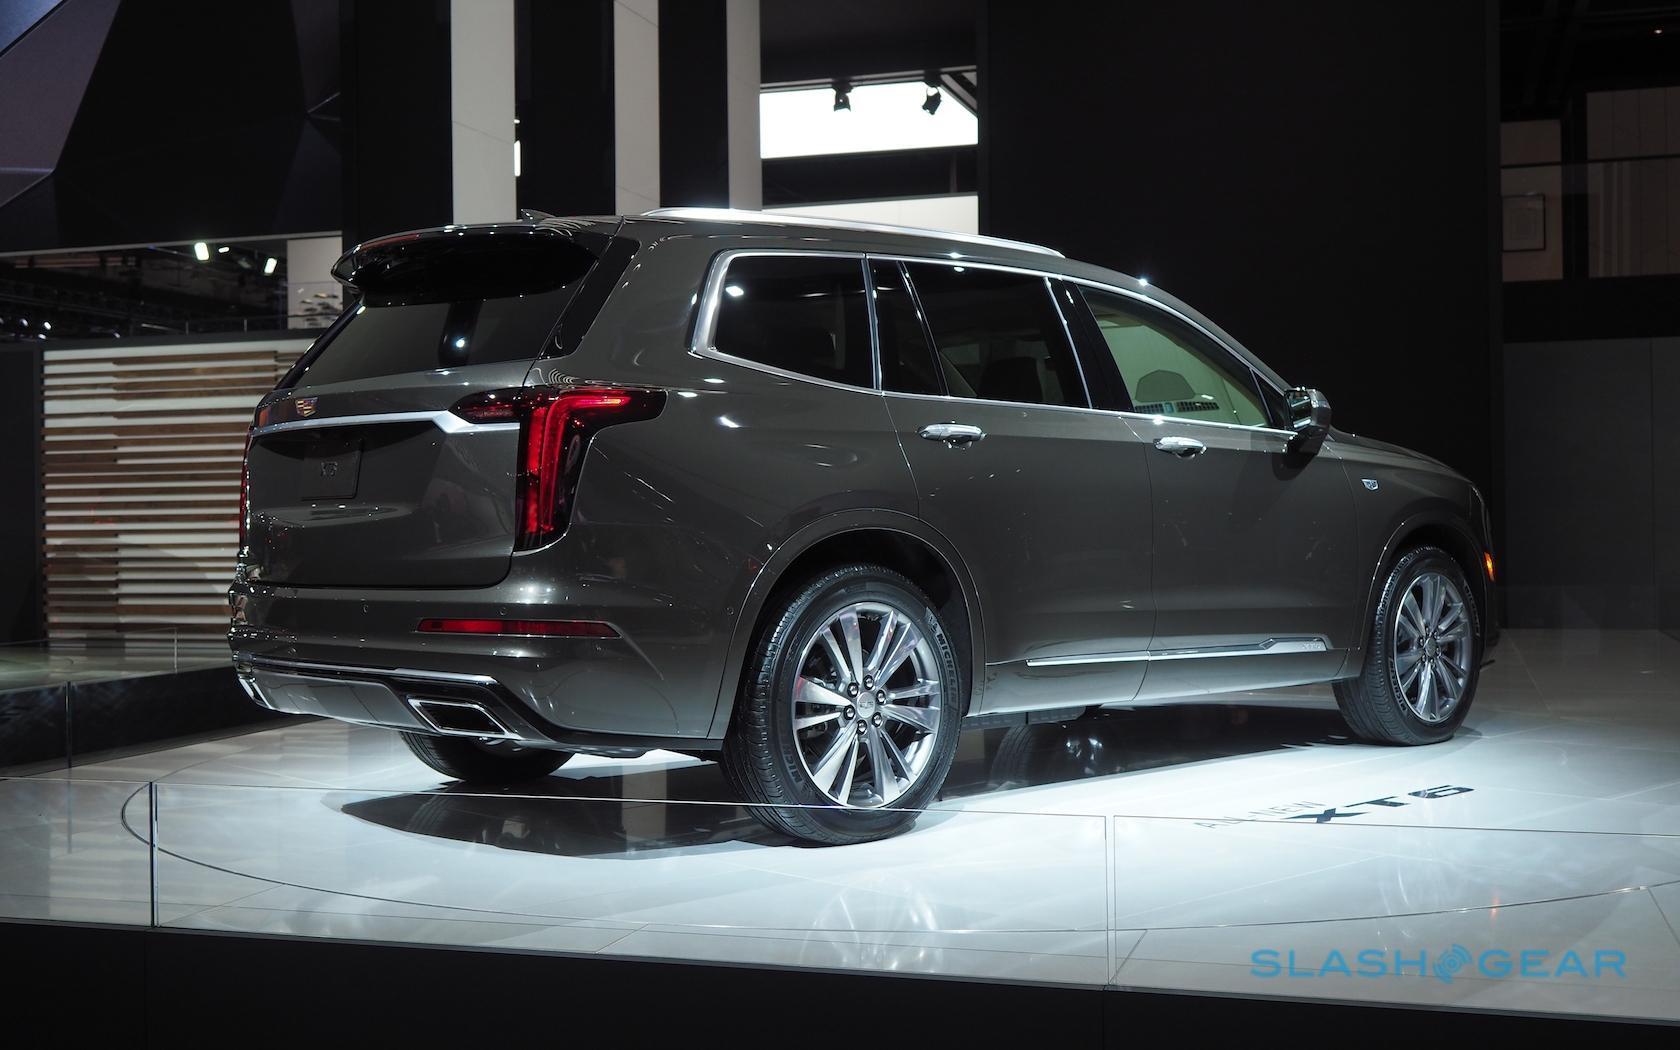 Familiar Suv Style Hides The 2020 Cadillac Xt6 S Big